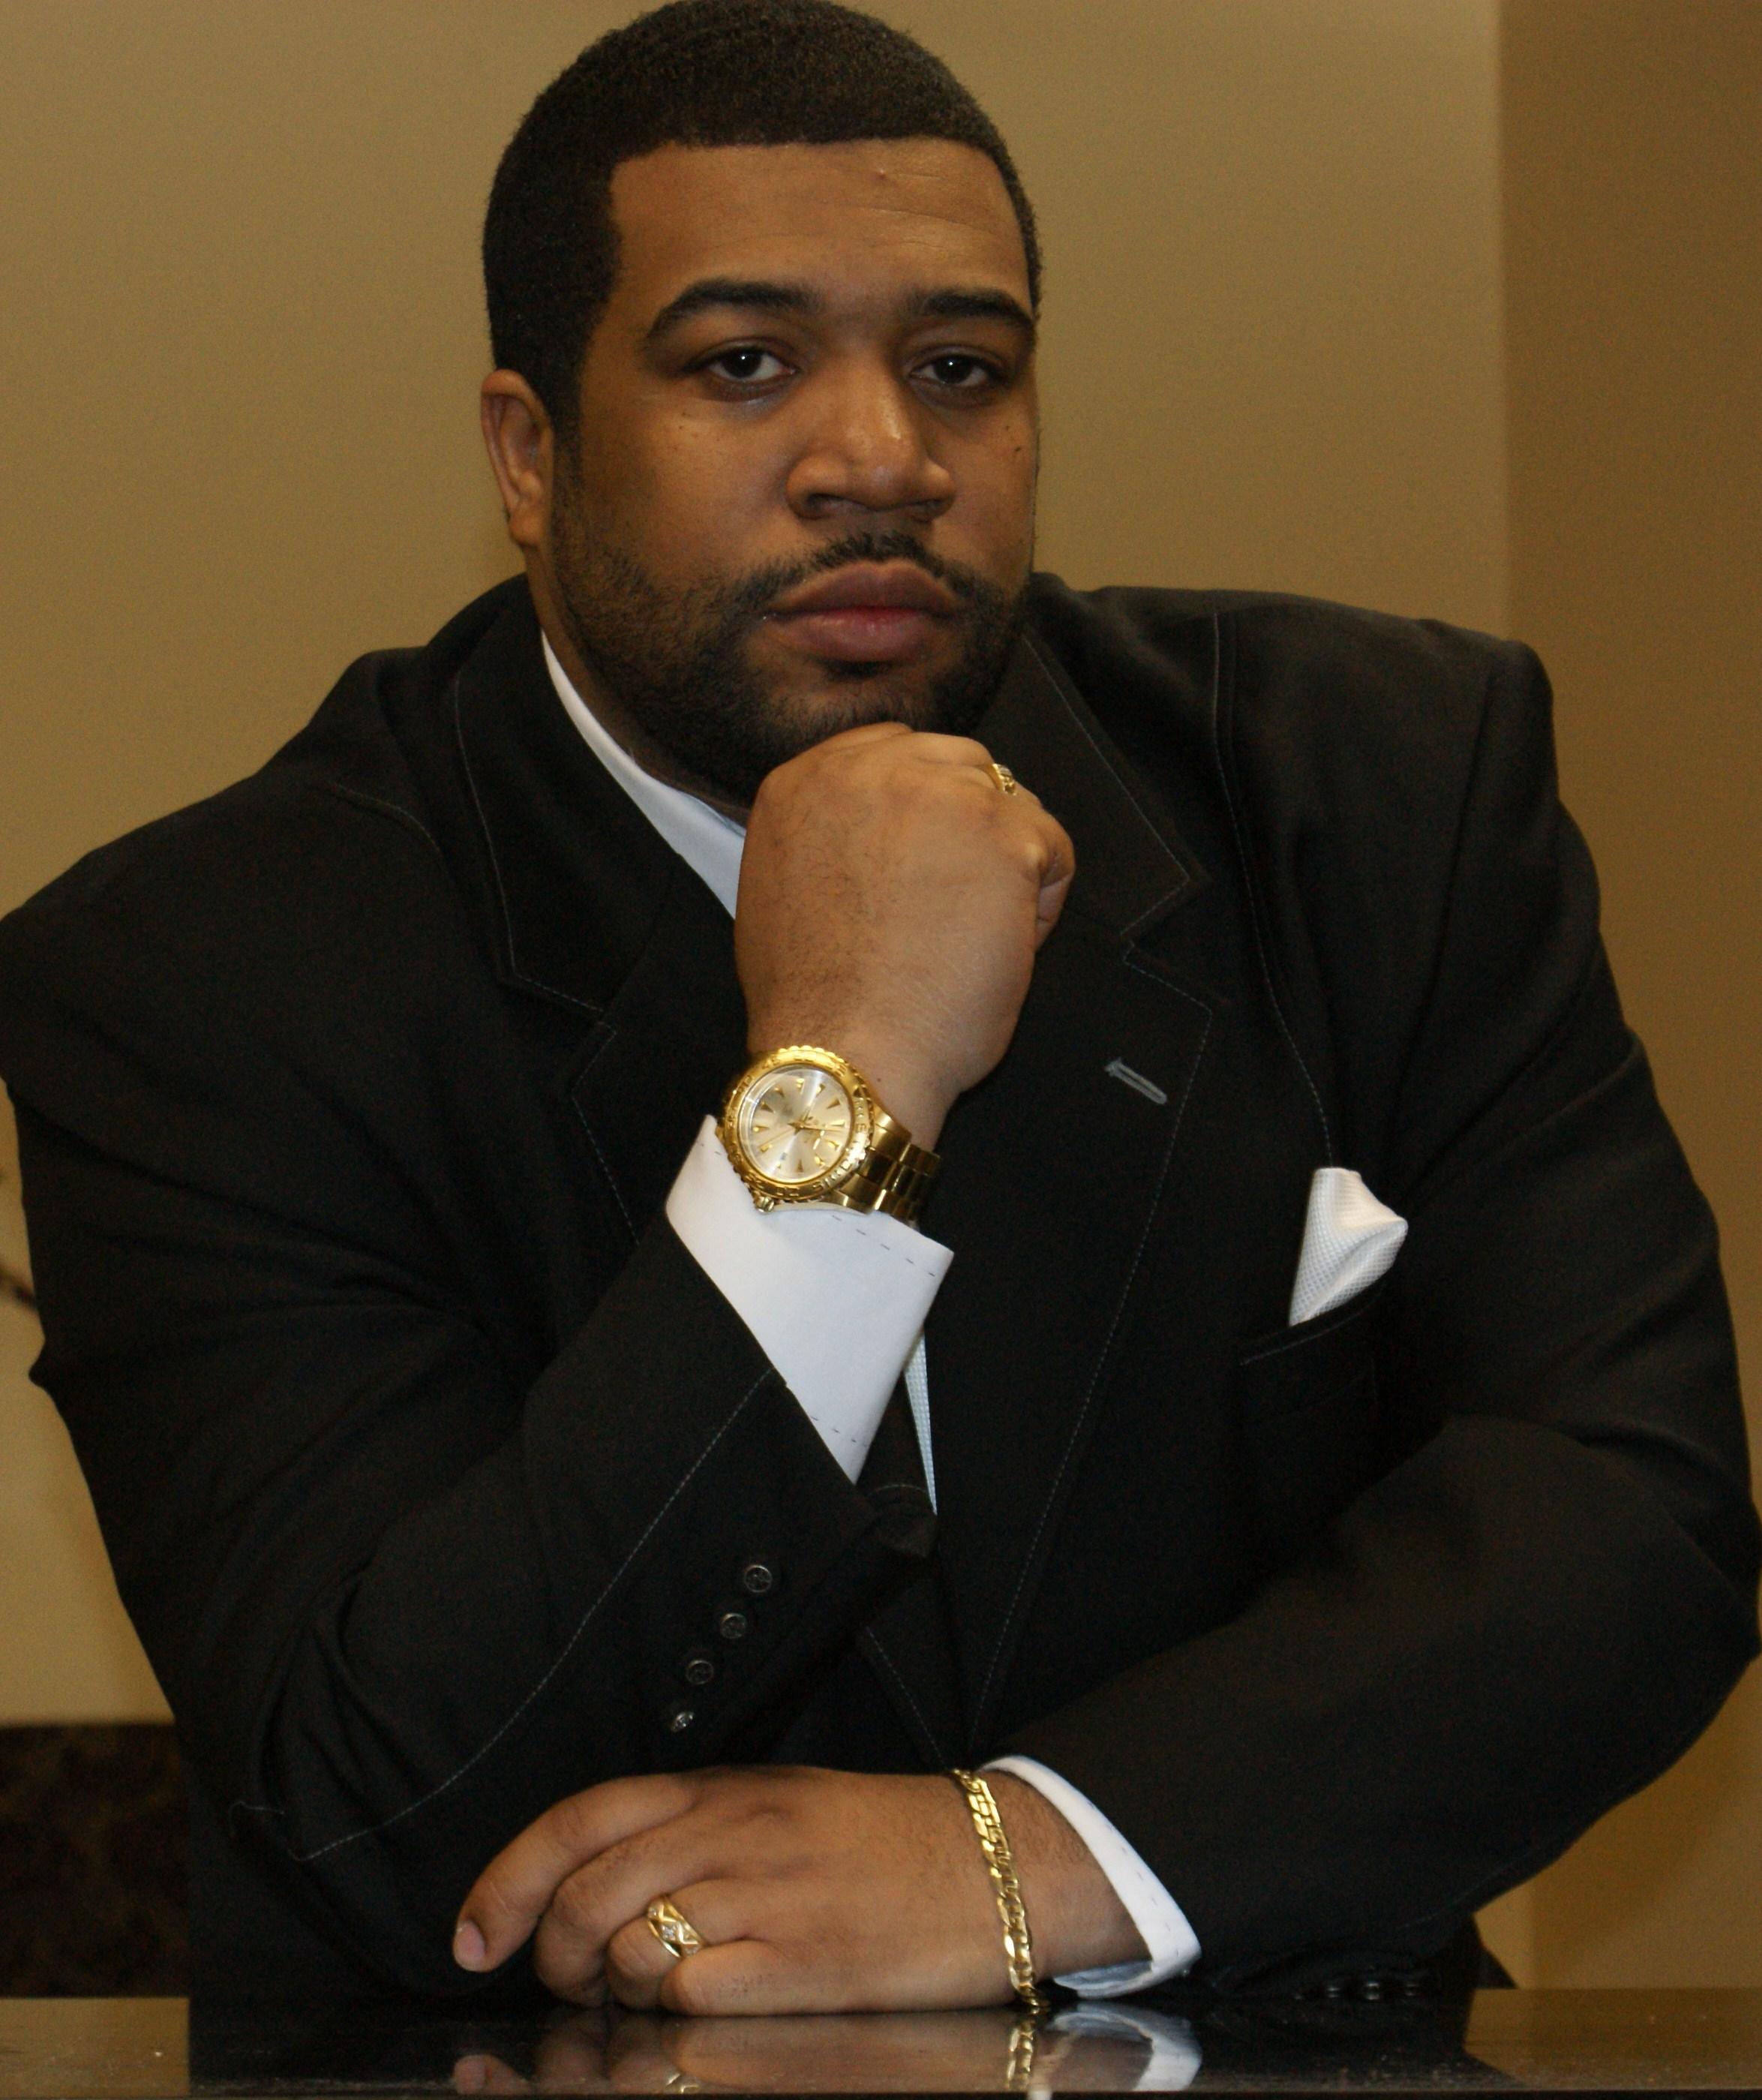 Bishop-Designate Robert Best Jr.